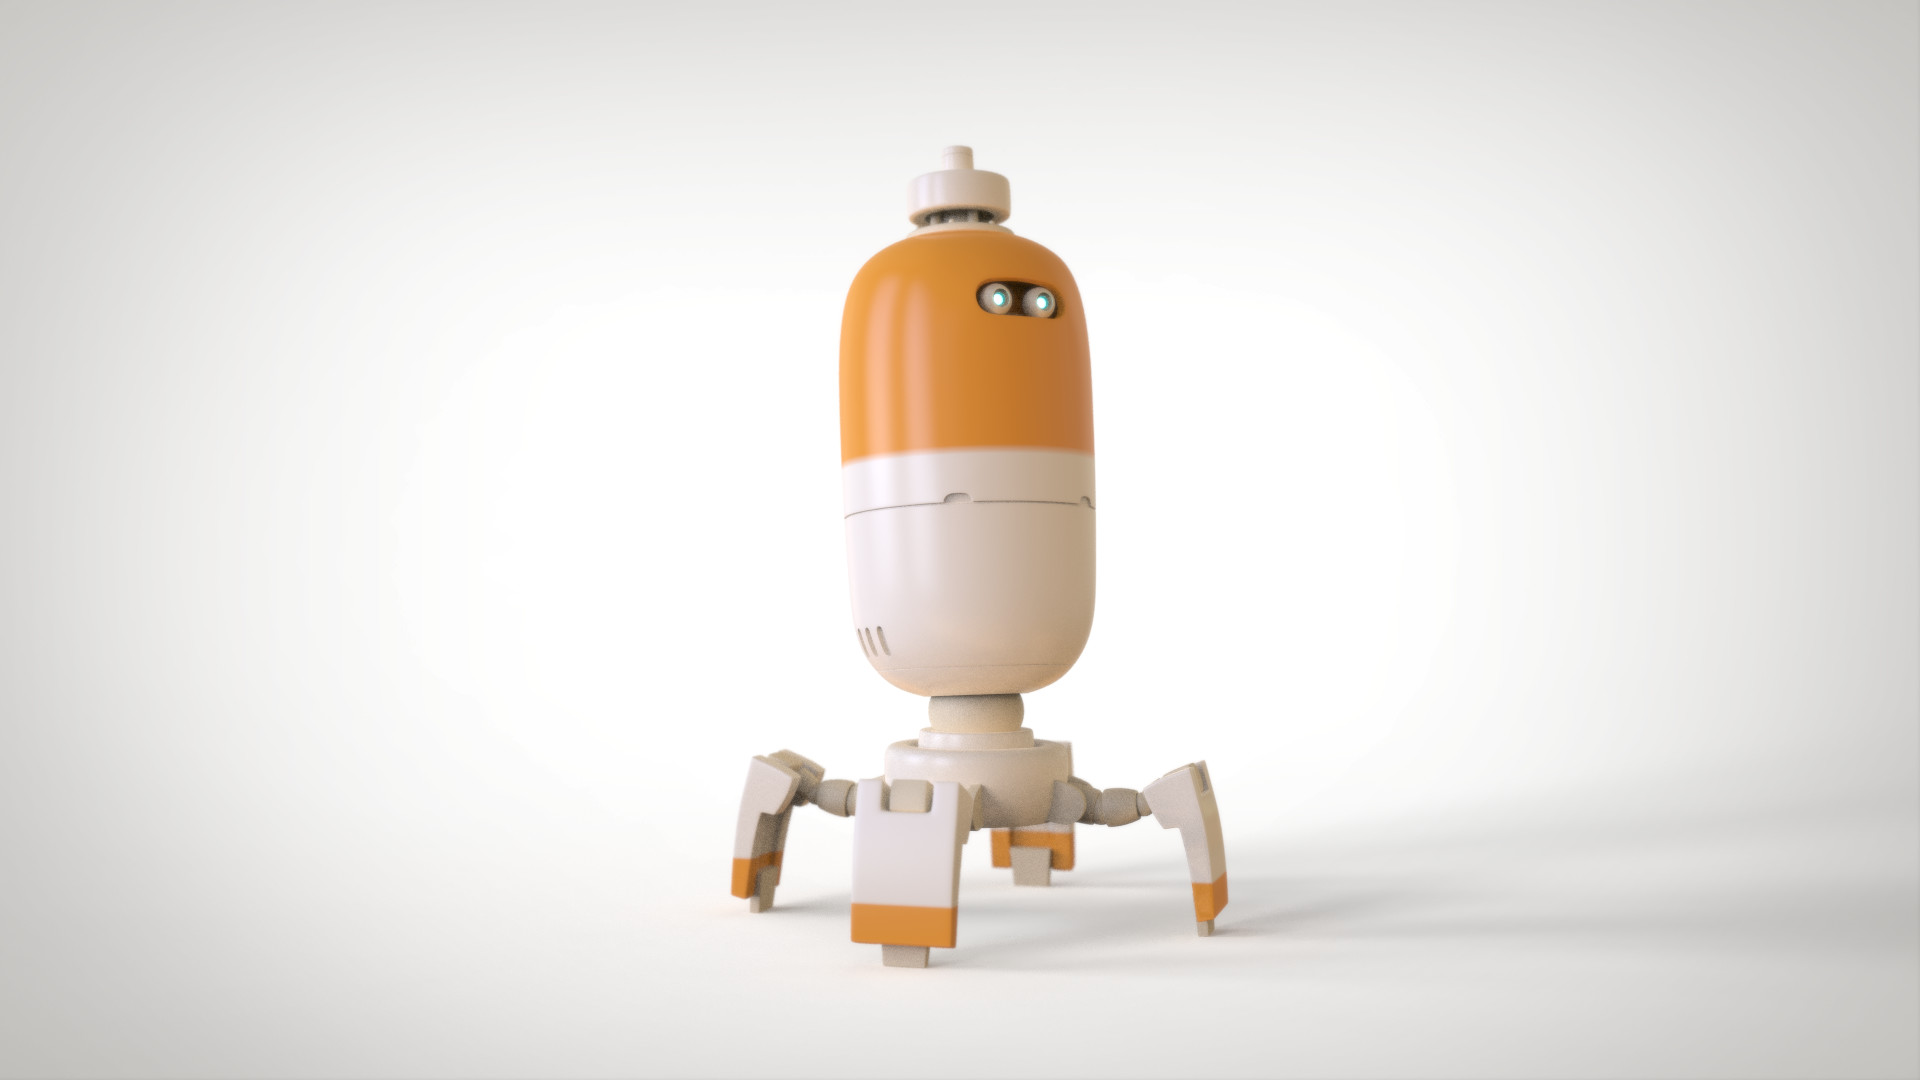 Erika eguia robot 02 1